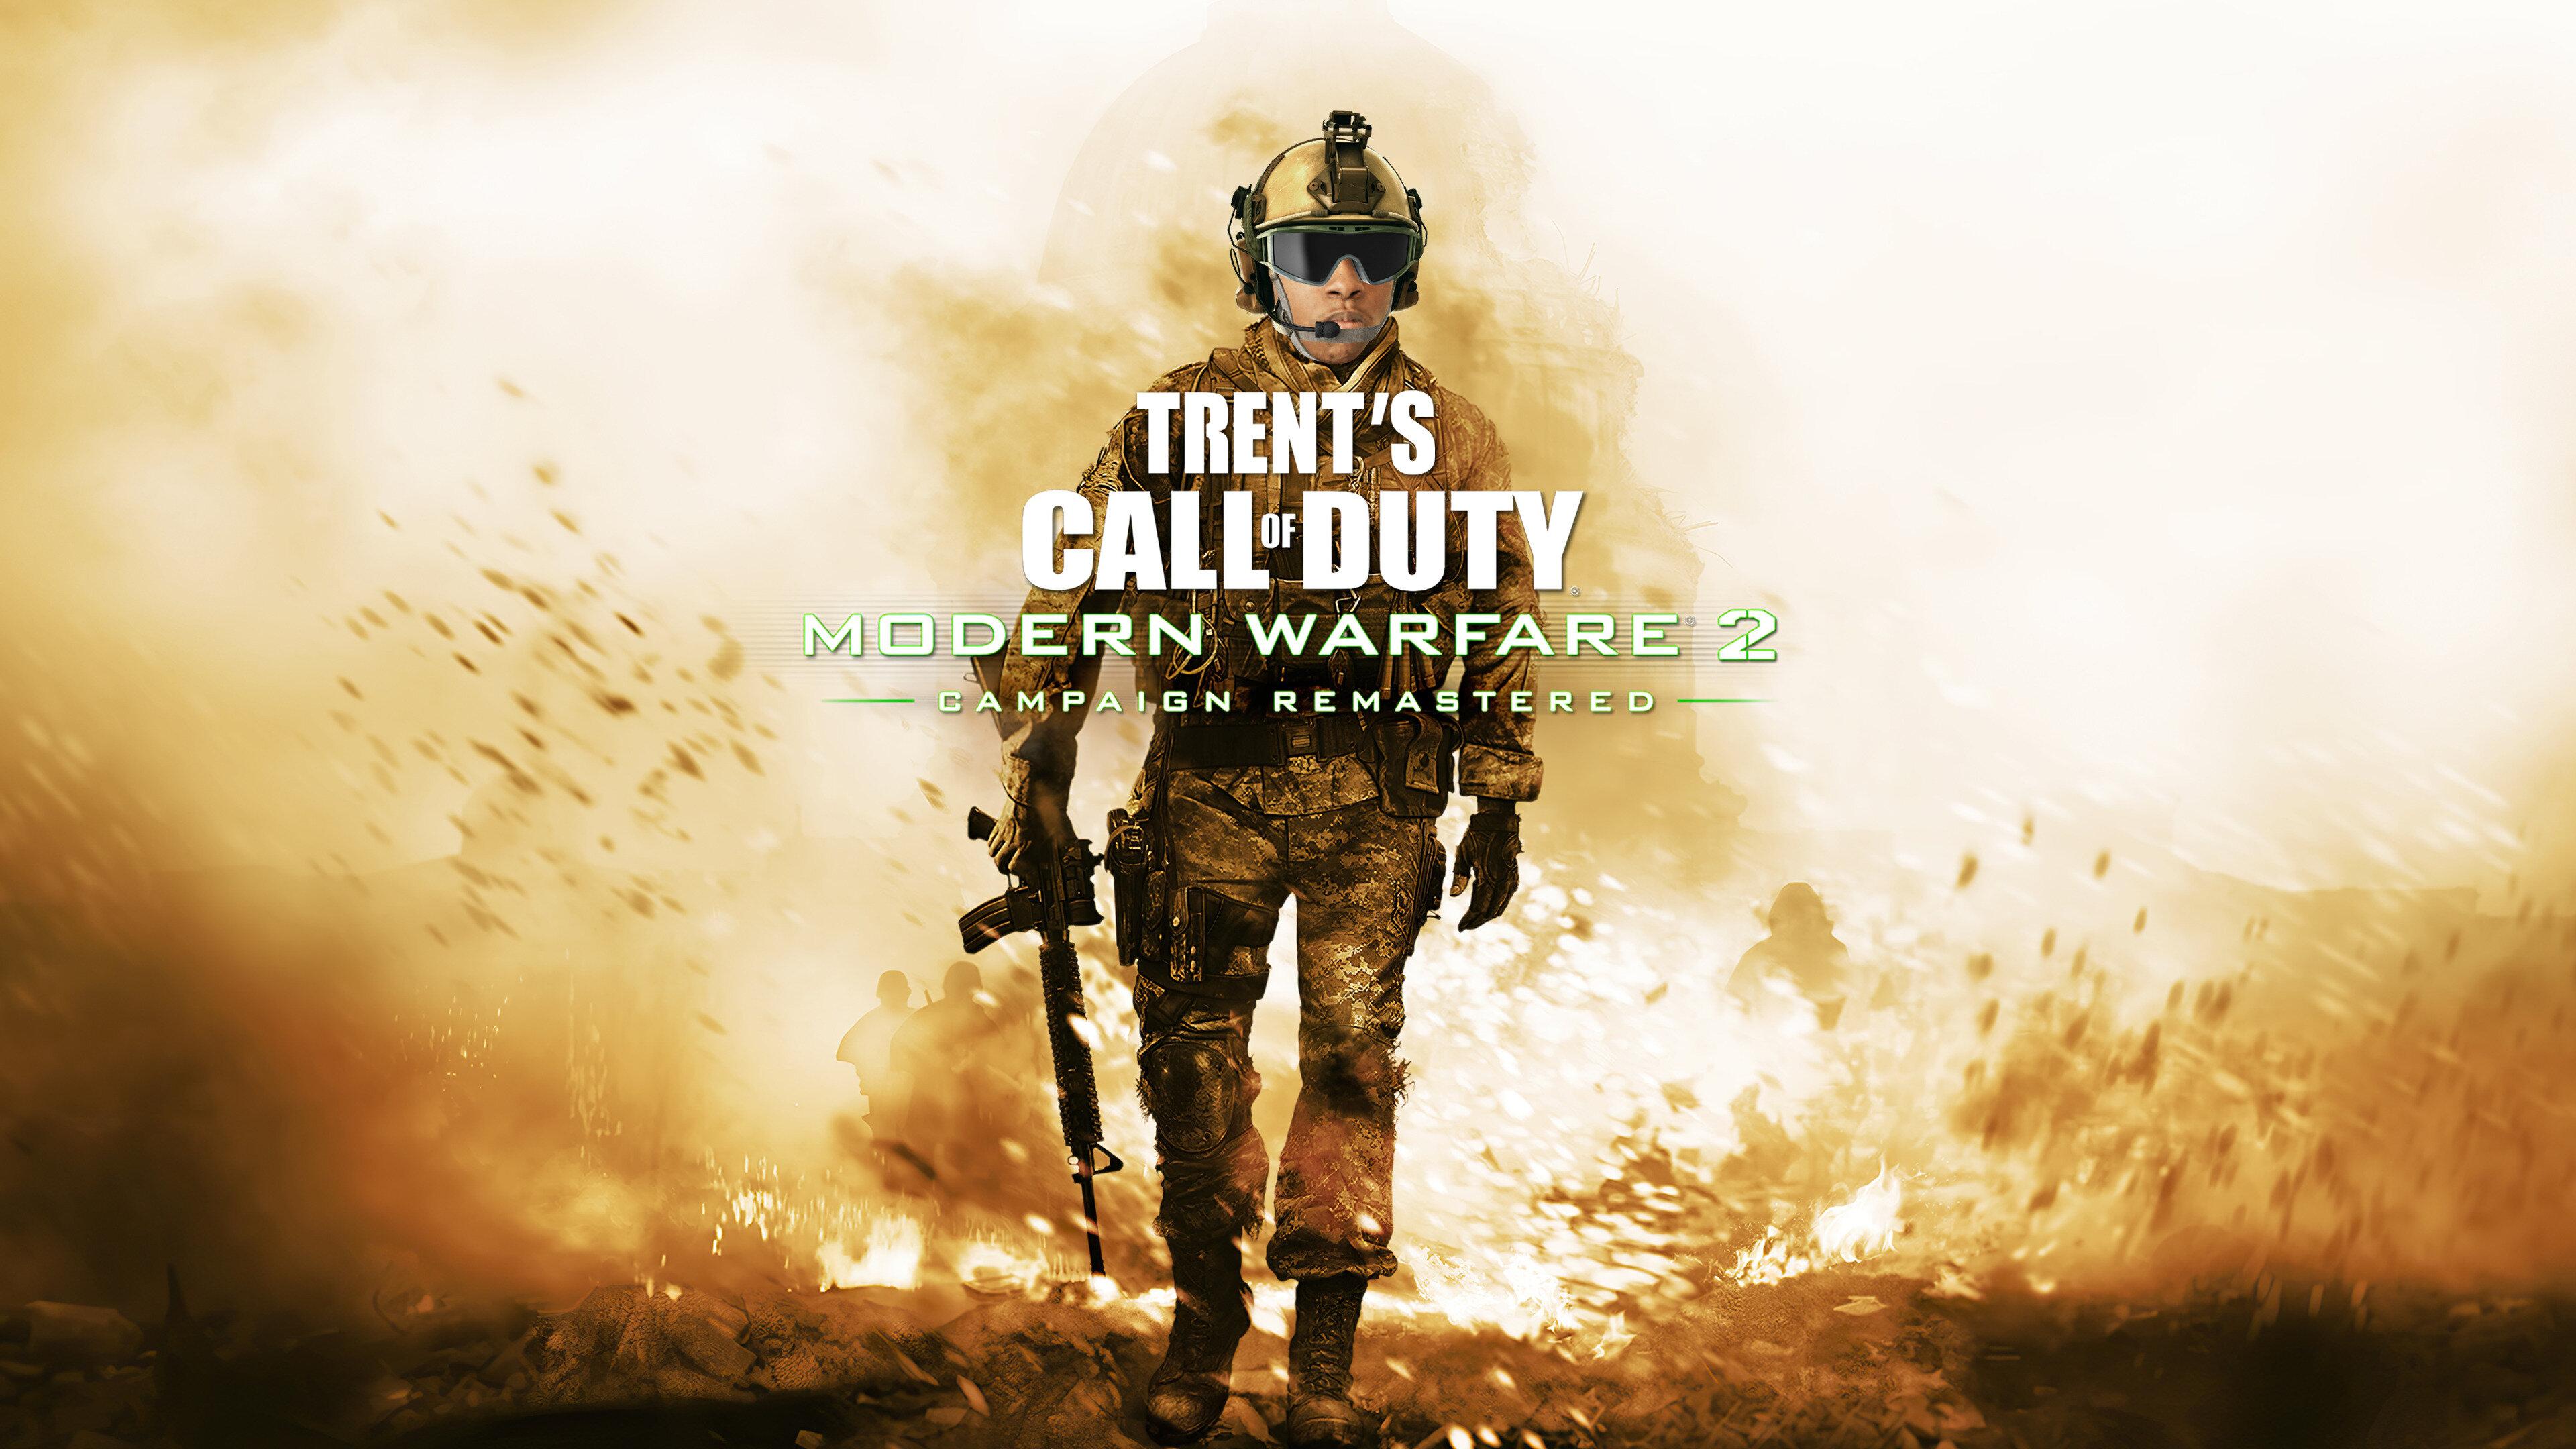 Trent's Modern Warfare 2 Remastered Campaign